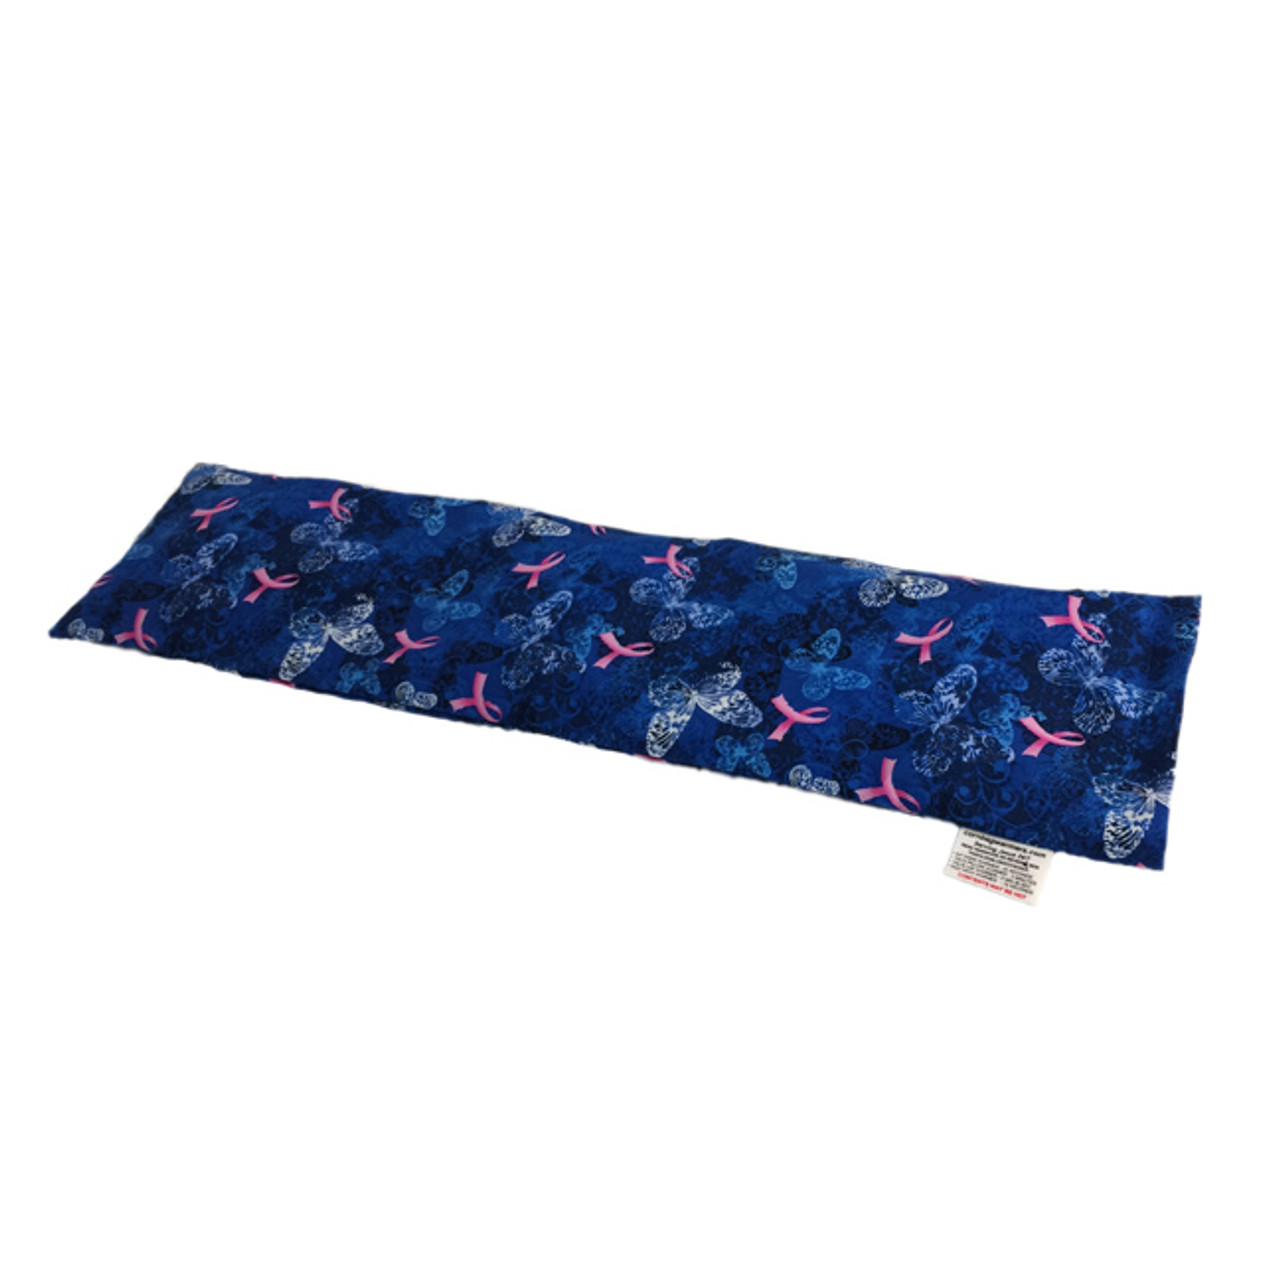 Butterflies- Blue Breast Cancer Awareness Neck Warmer Microwave Heating Pad